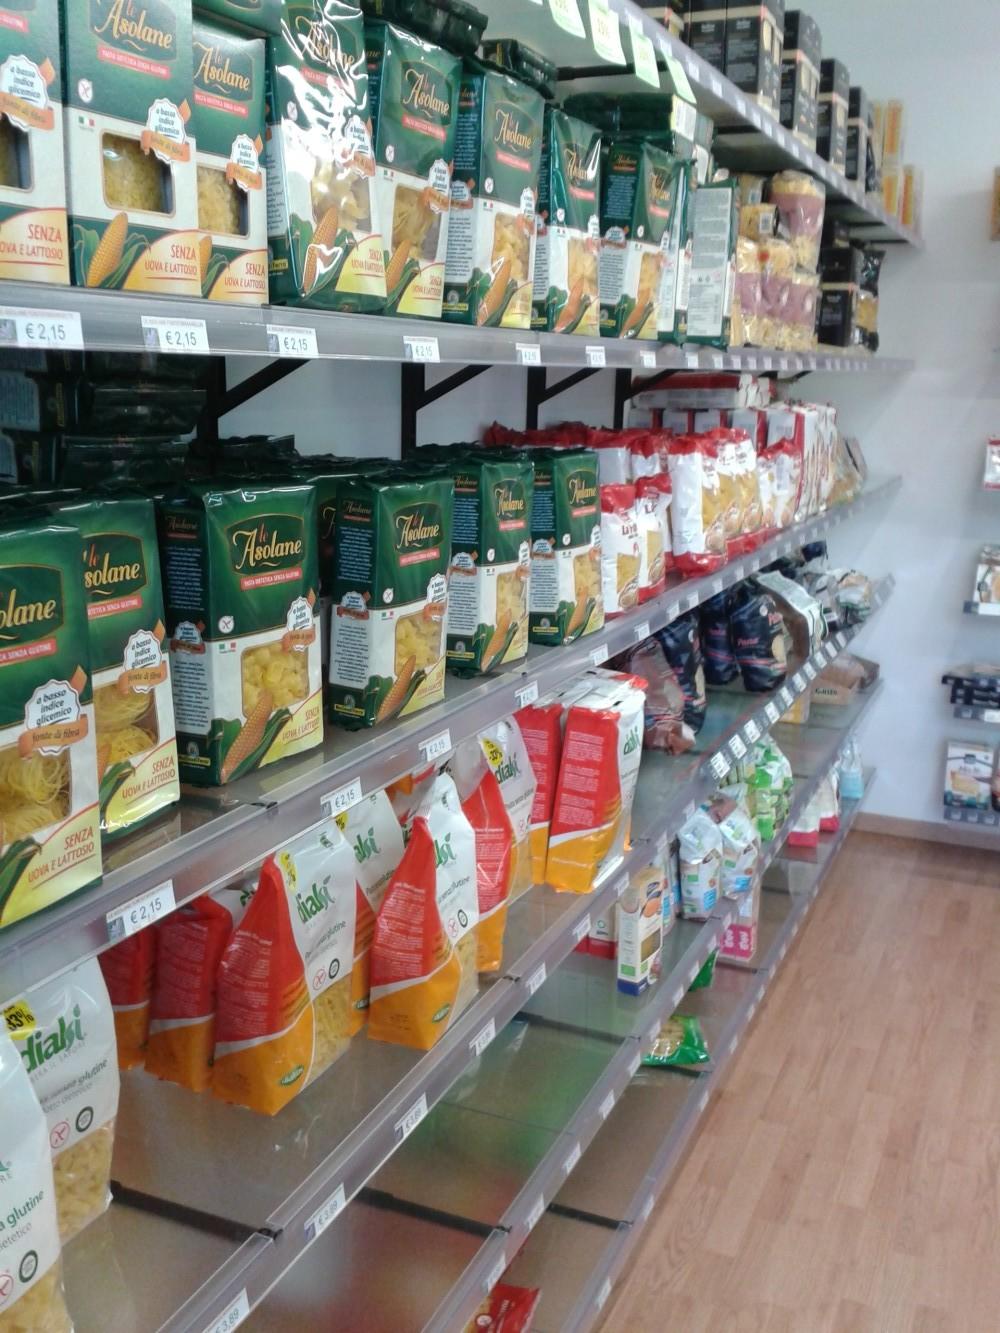 Celiachia Food Prodotti Senza Glutine 01